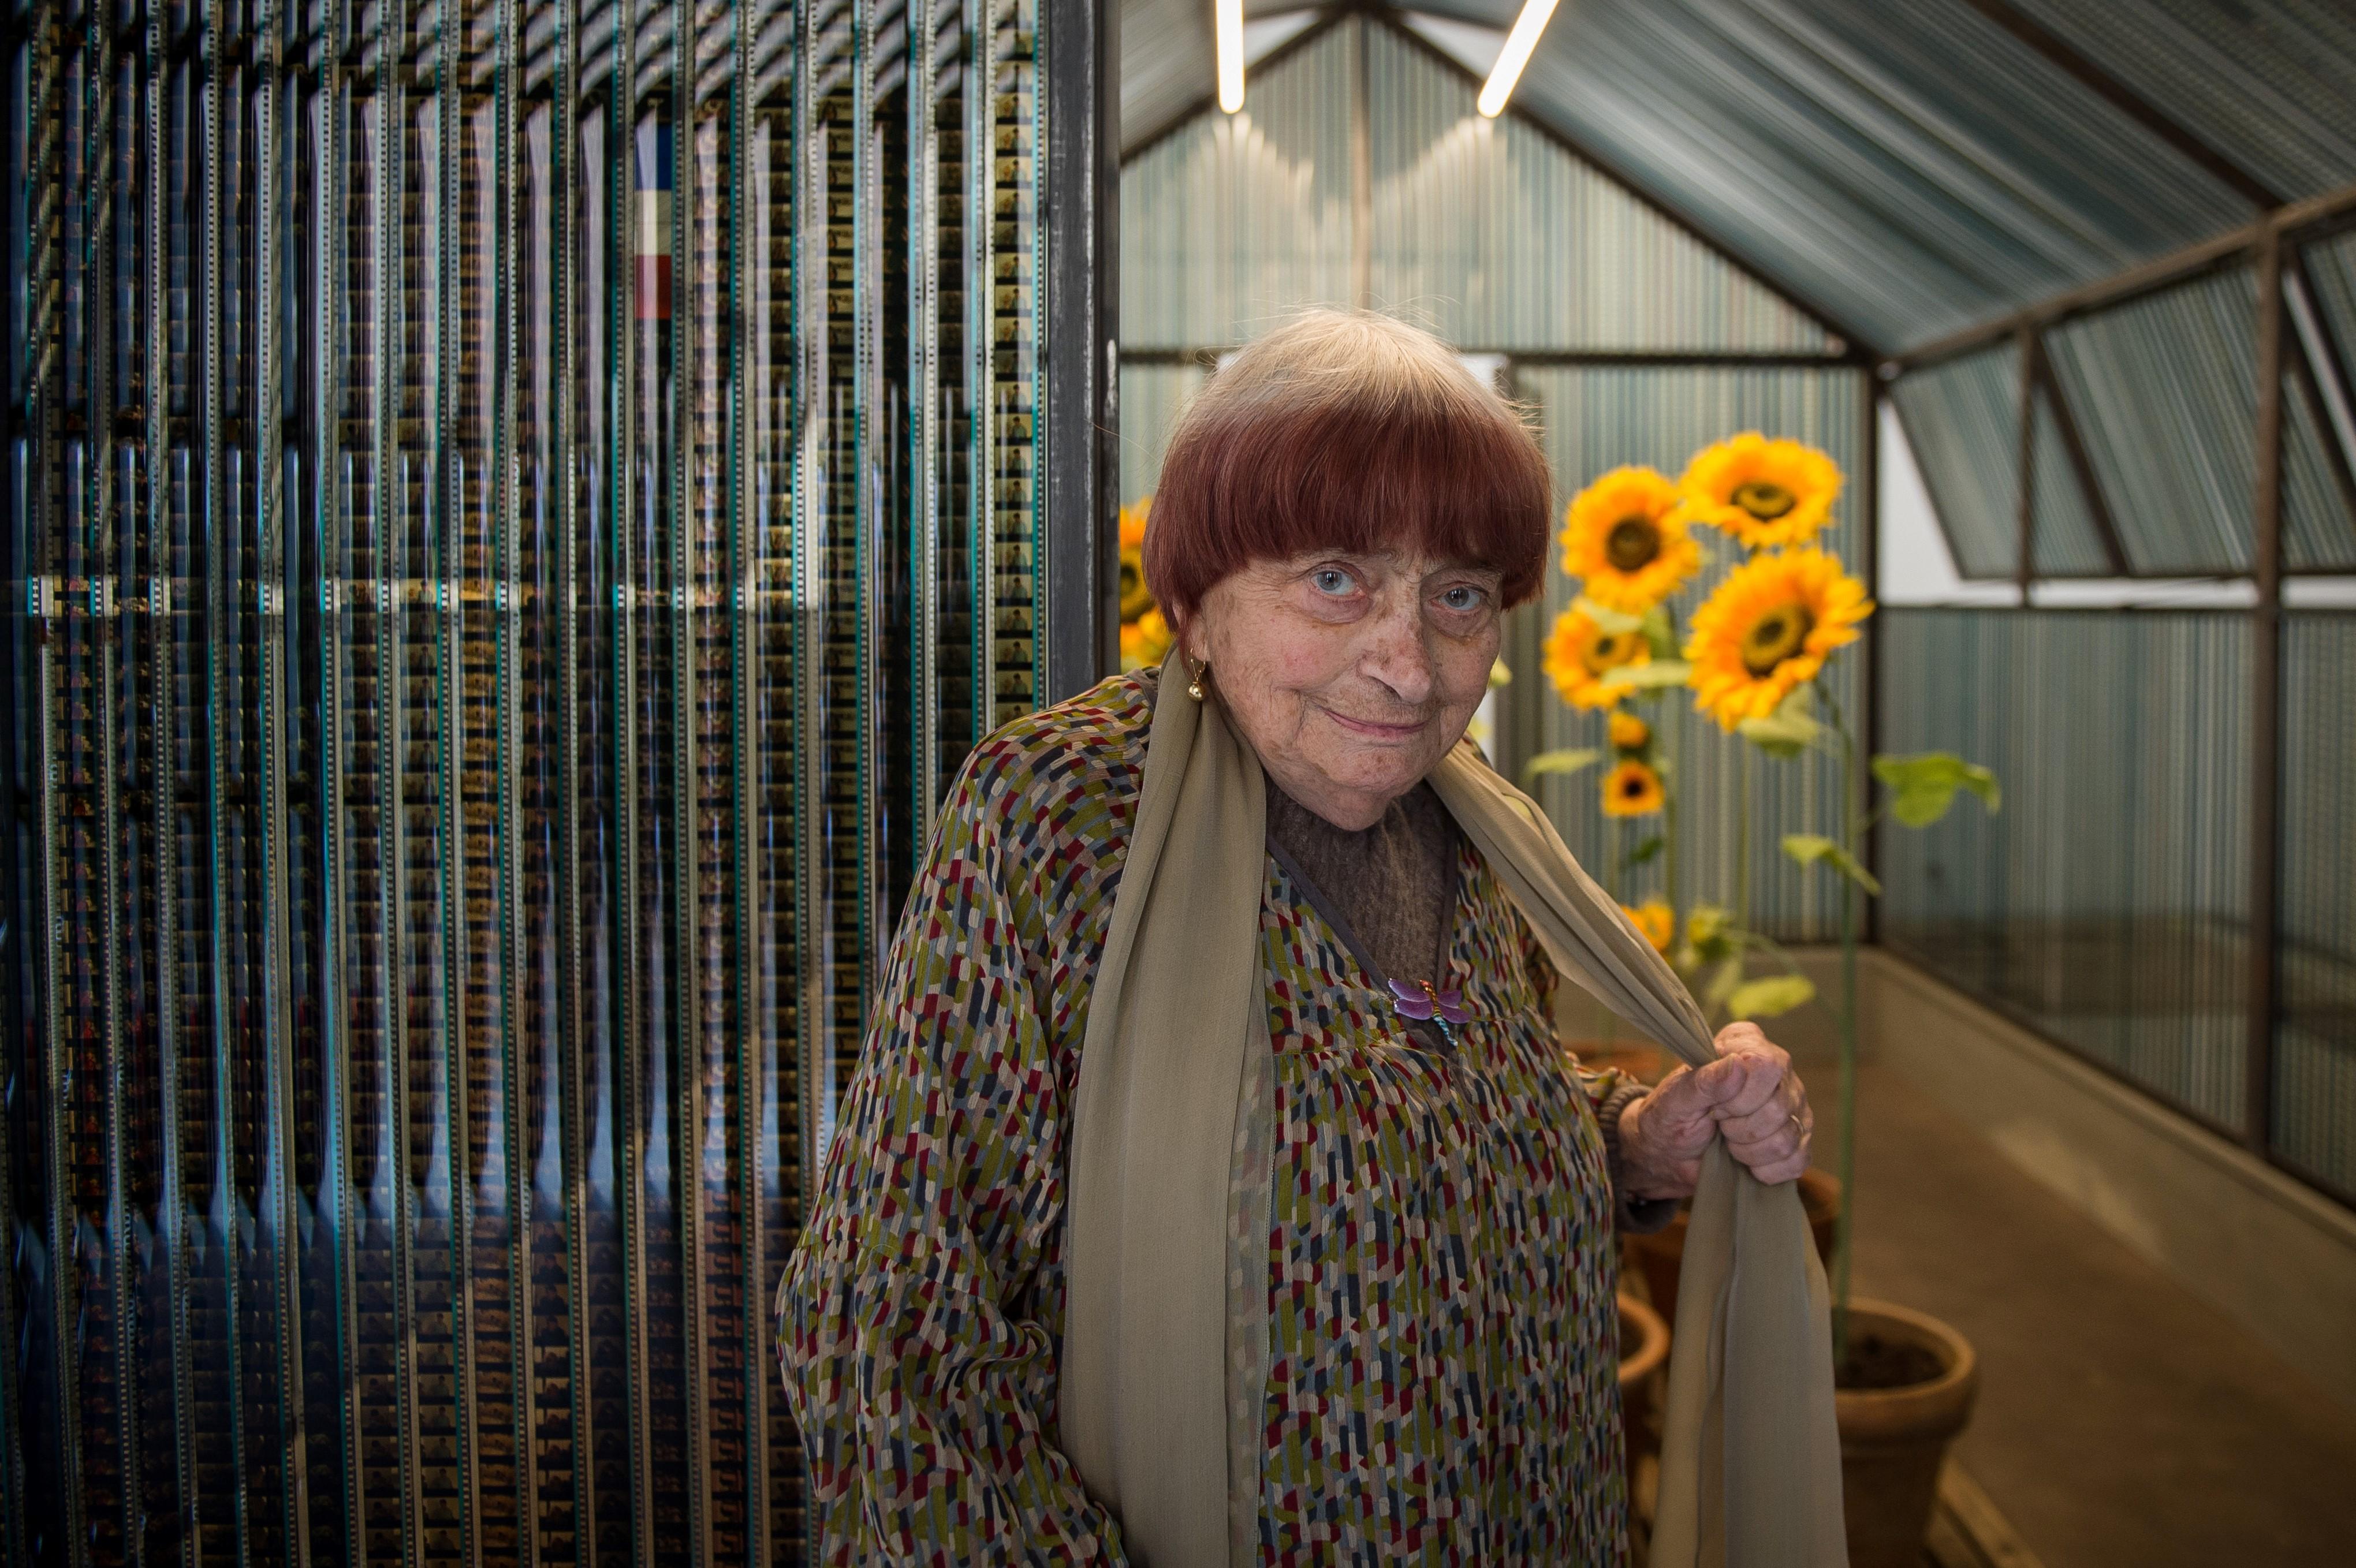 Murió Agnès Varda, la mítica cineasta francesa a los 90 años - Infobae